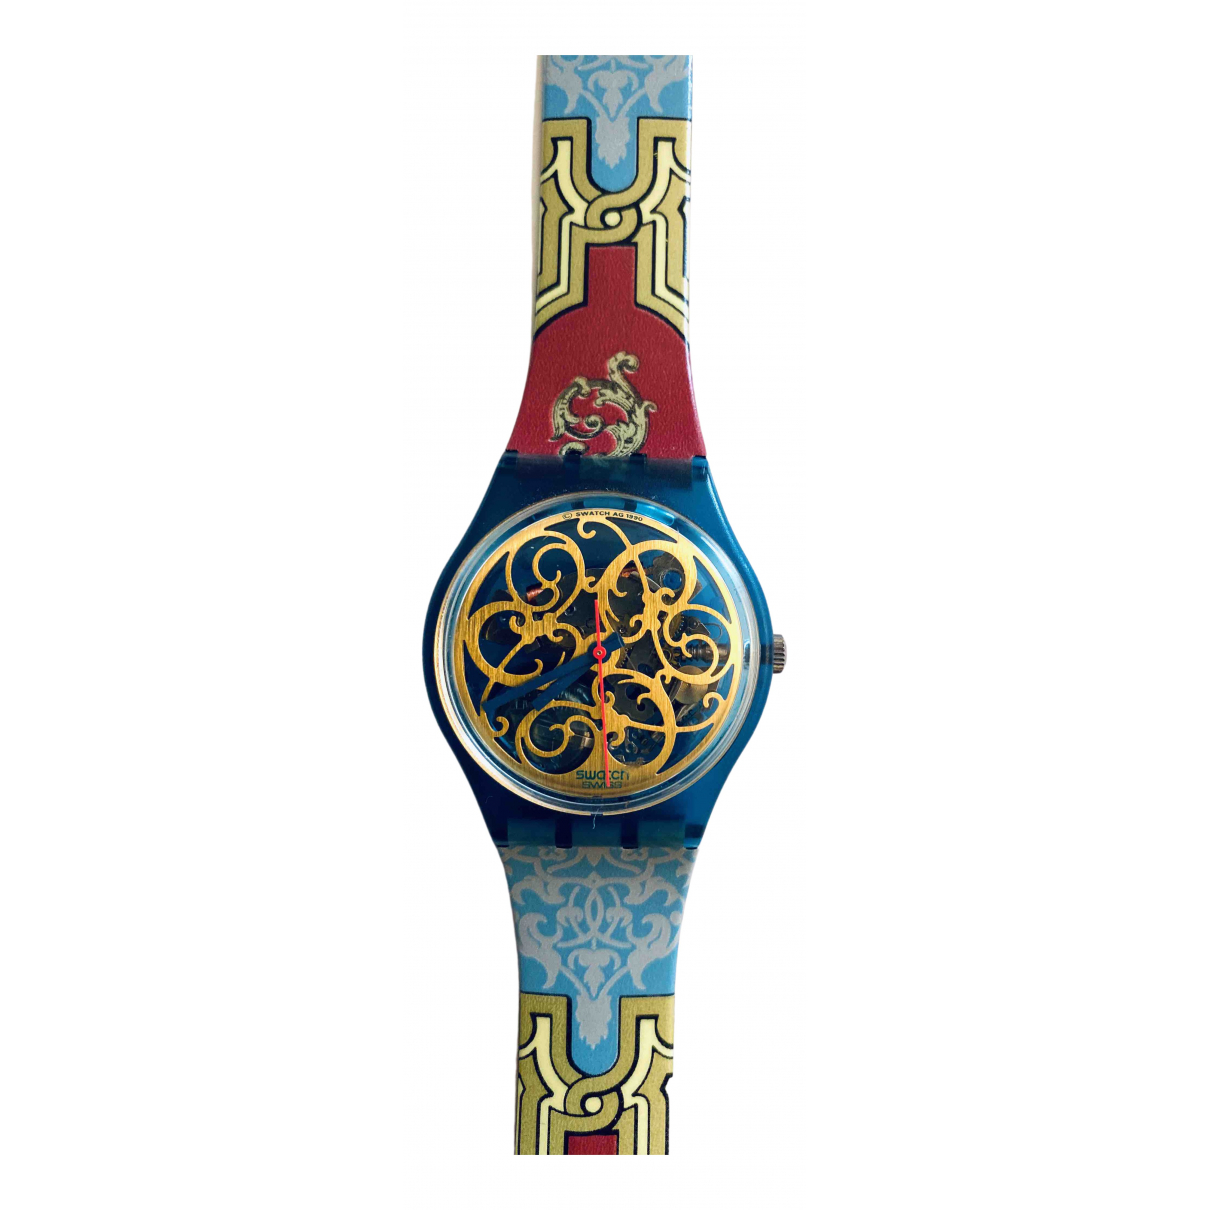 Swatch \N Multicolour watch for Women \N